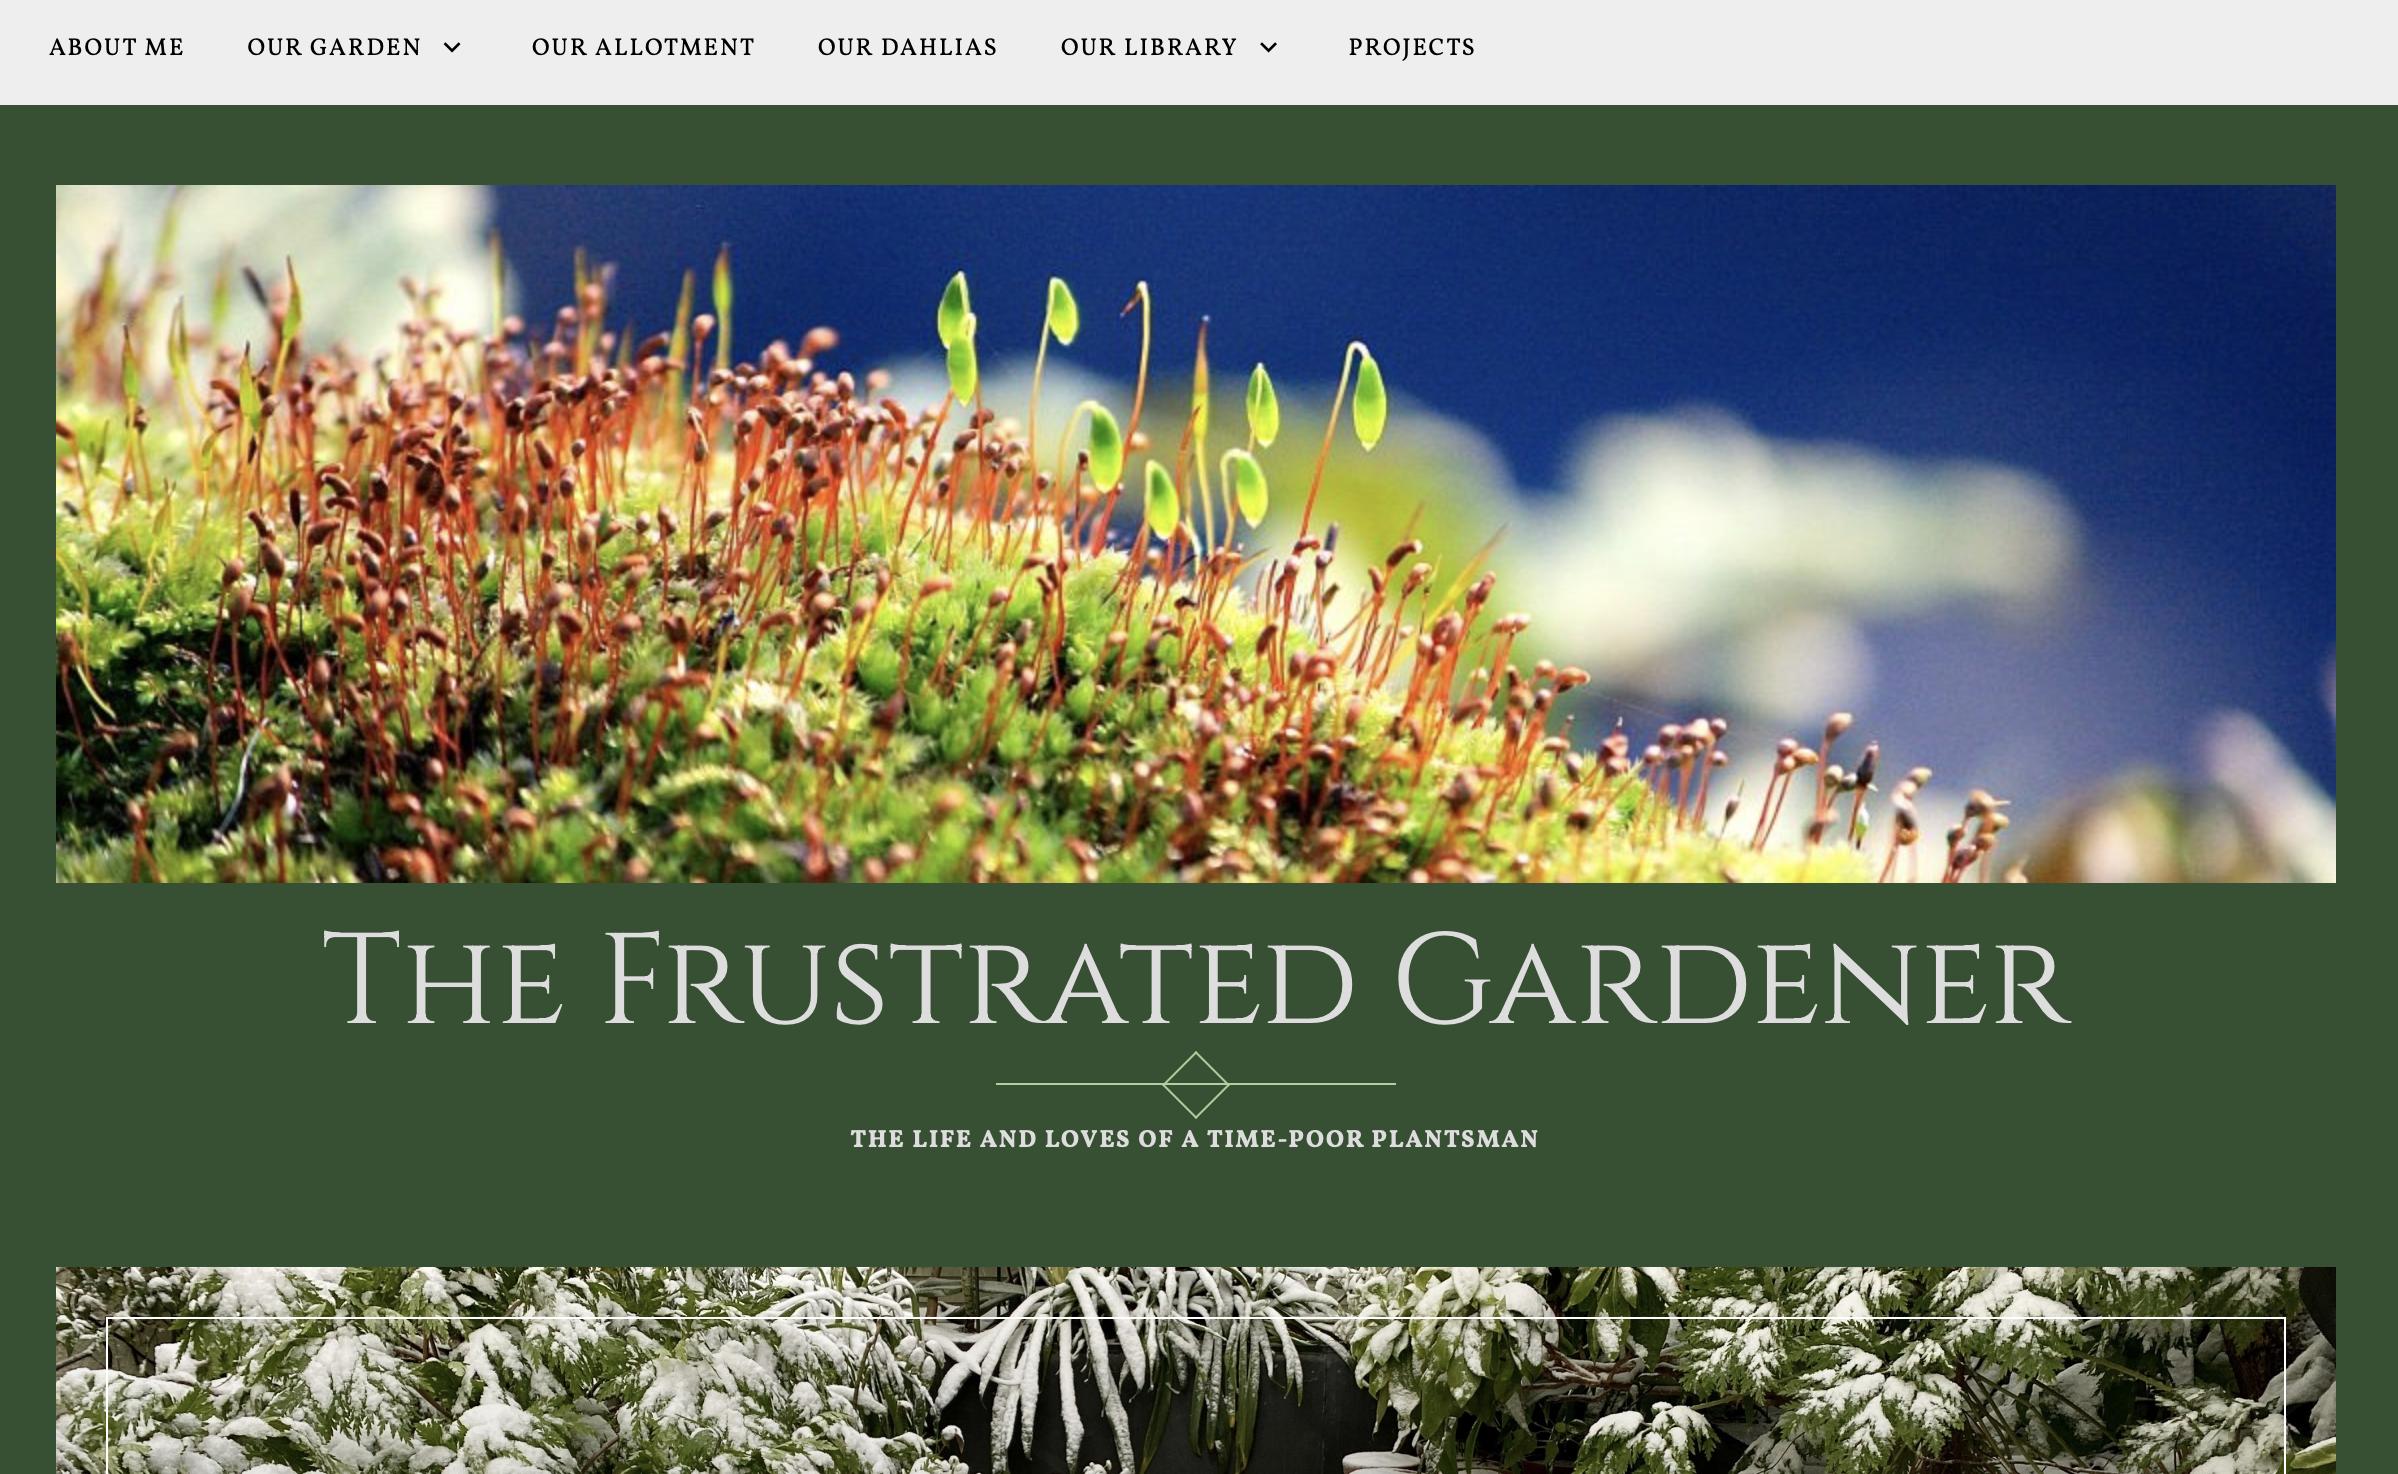 The Frustrated Gardener